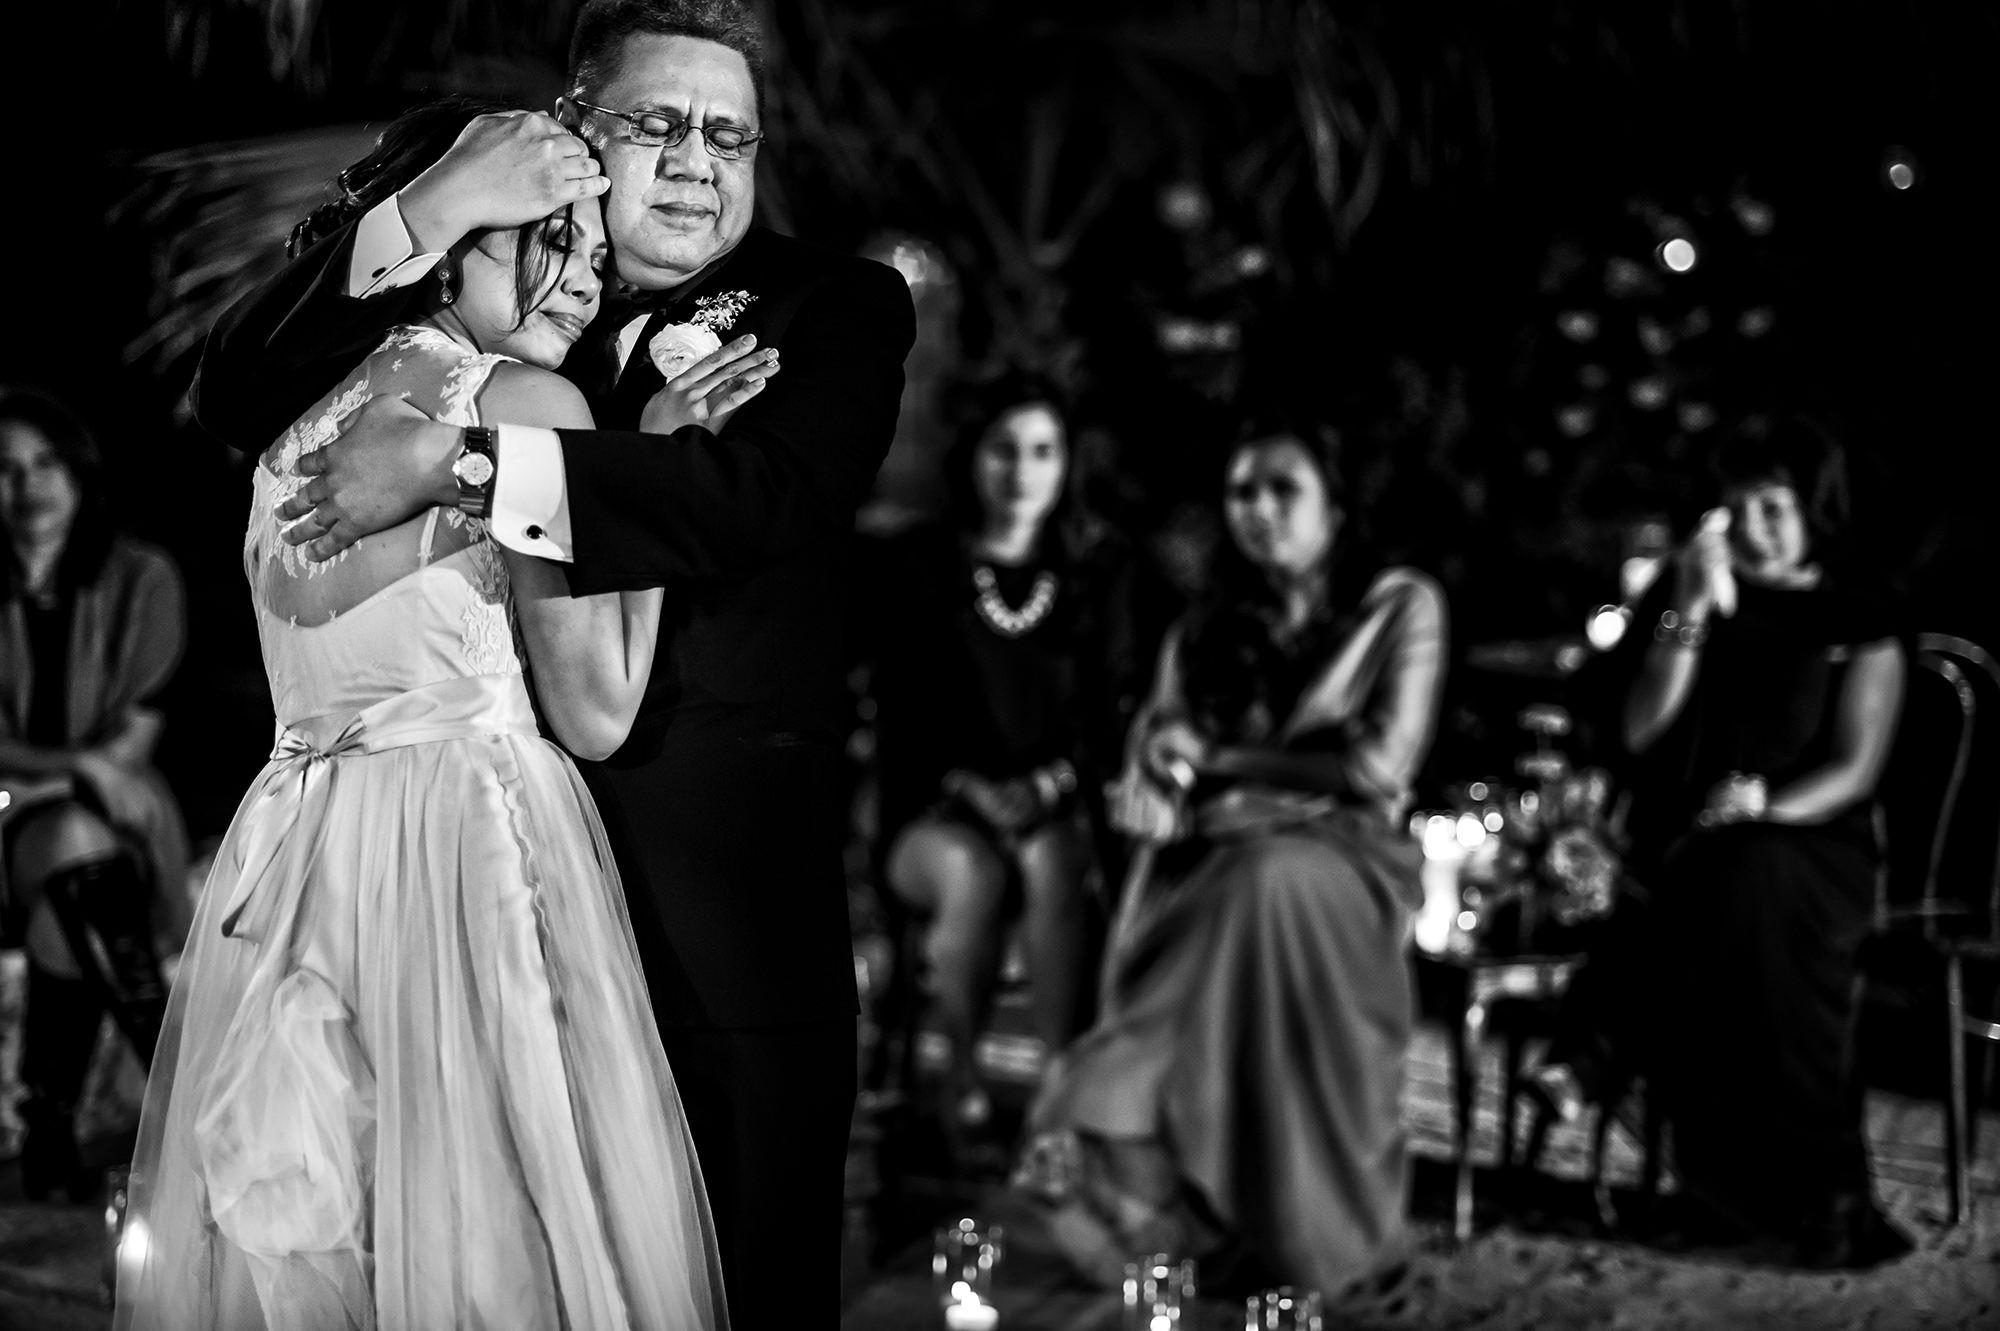 Dad hugging bride during formal dance - Davina + Daniel